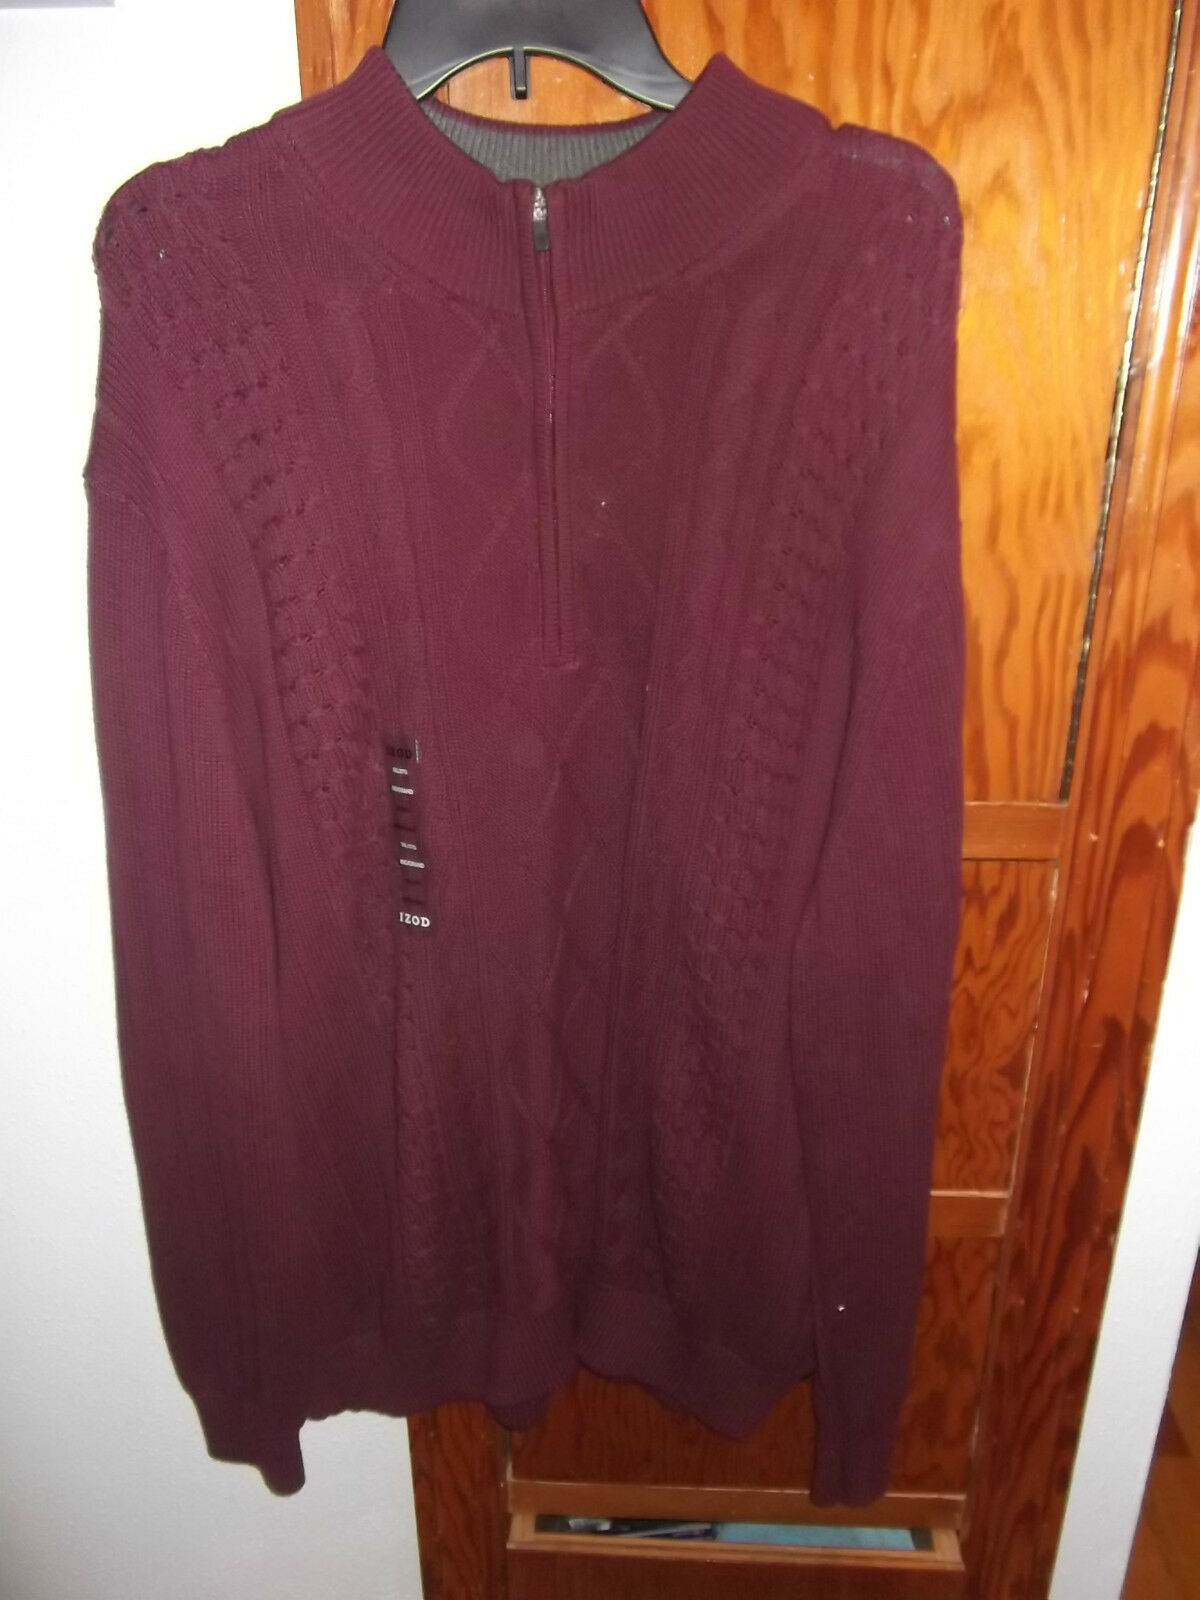 Big Men's IZOD Cable Knit Quarter Zip Sweater Size 3xl Tall Tag ...